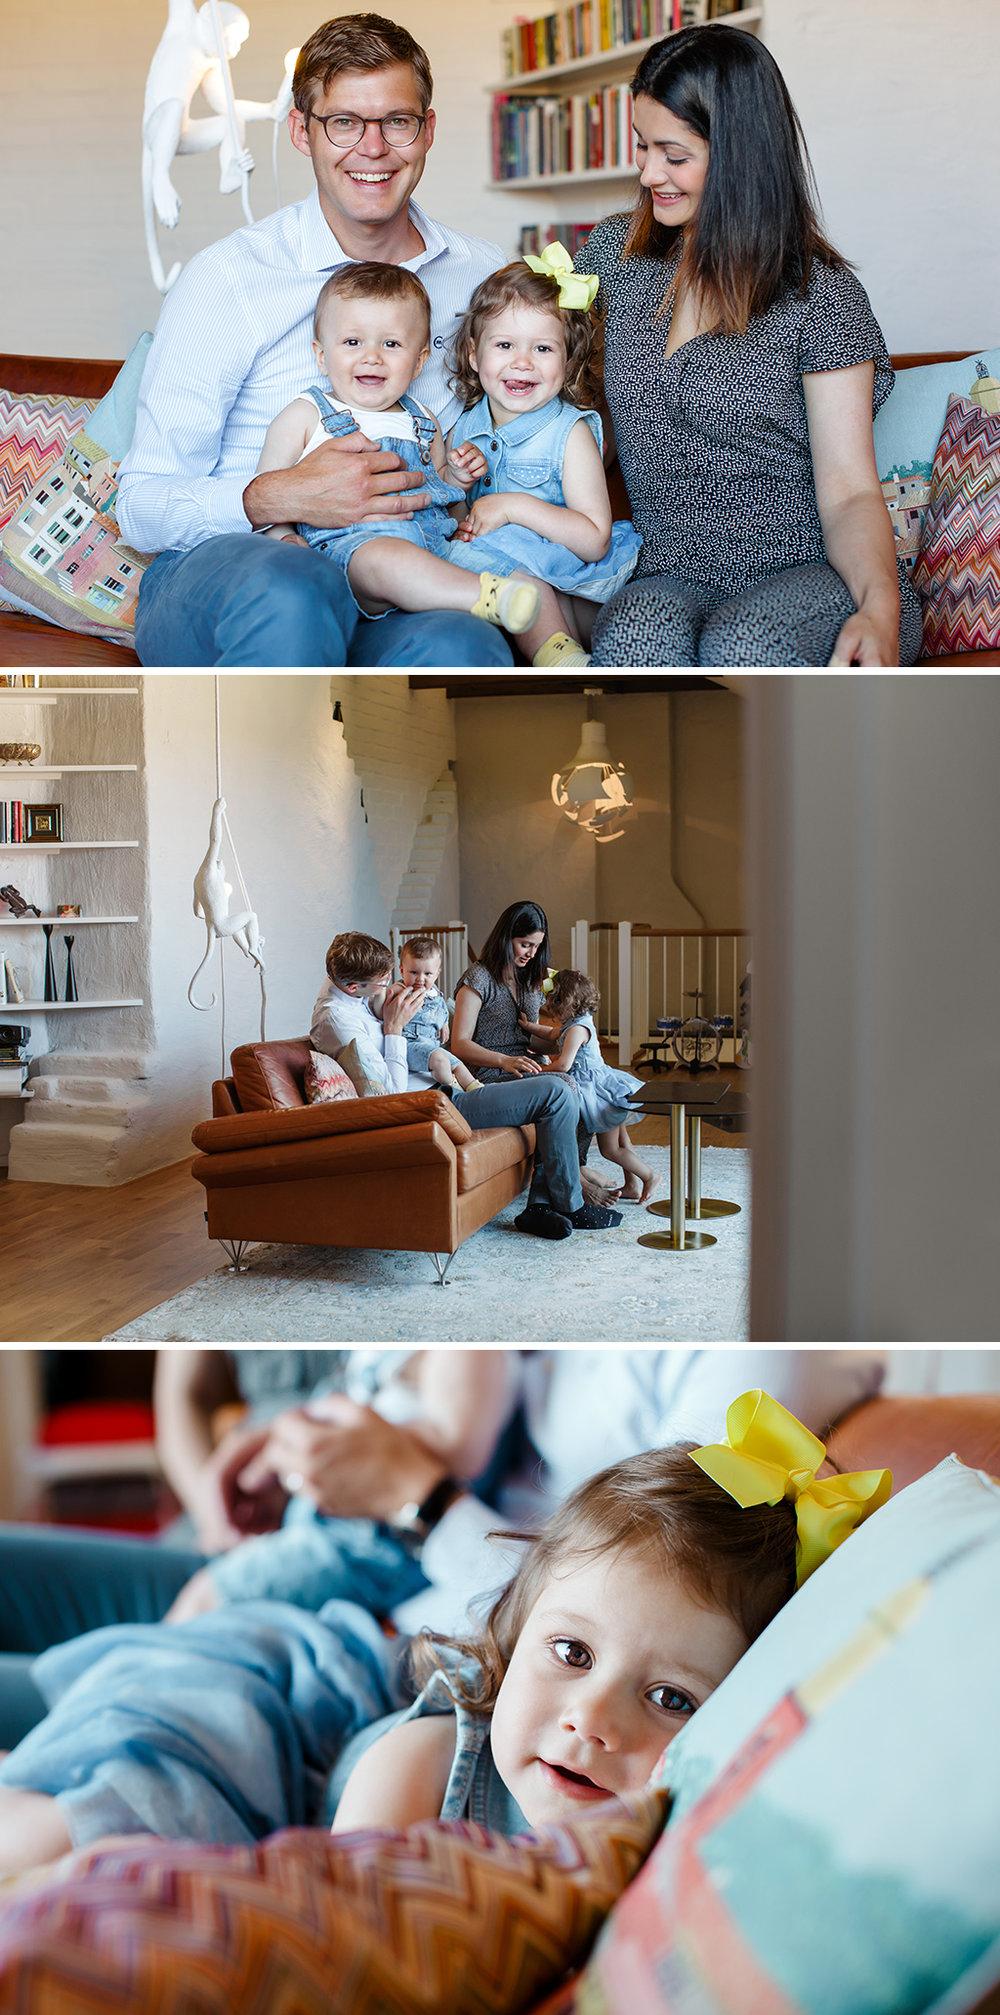 Lifestyle-hemma-hos-fotografering_familjefotograf-Stockholm.jpg